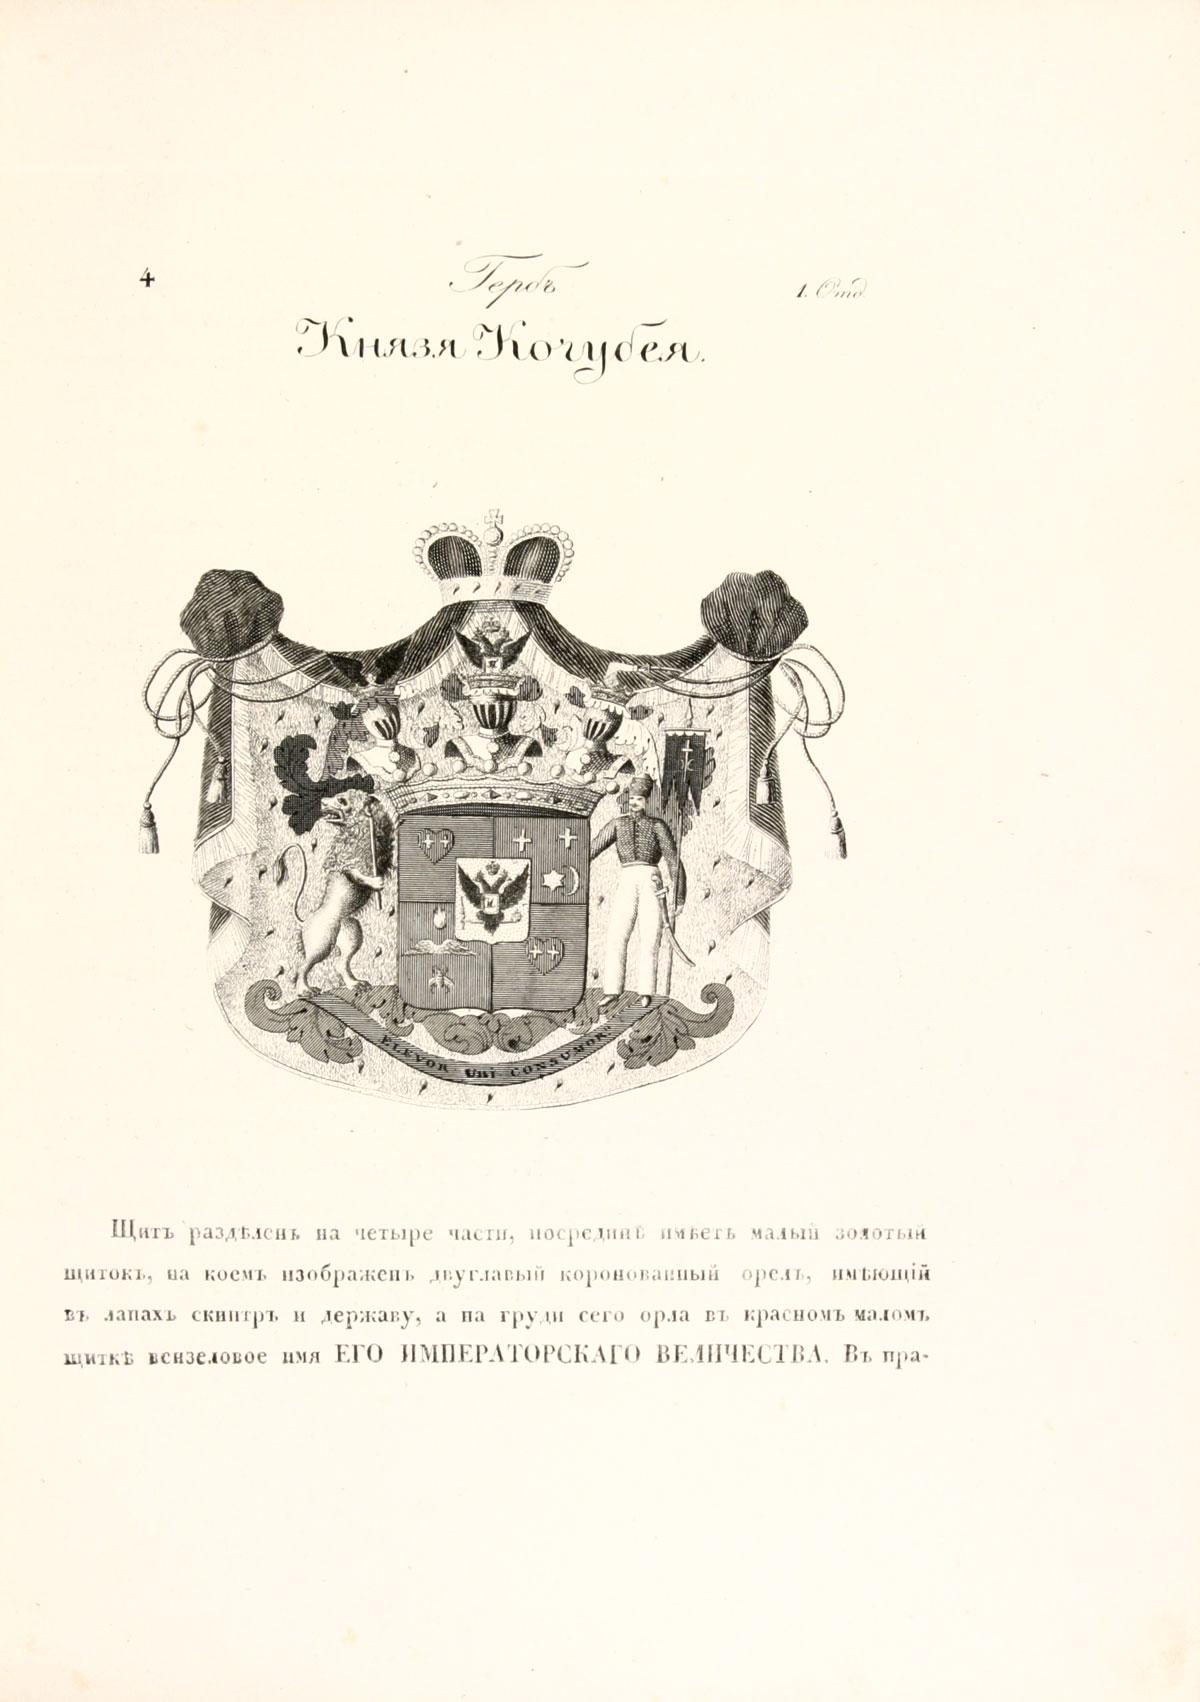 Герб князя Кочубея, стр. 1